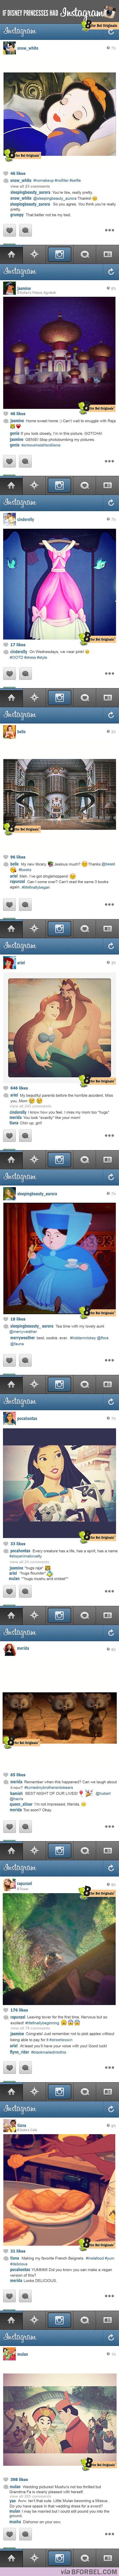 If Disney princesses had Instagram.